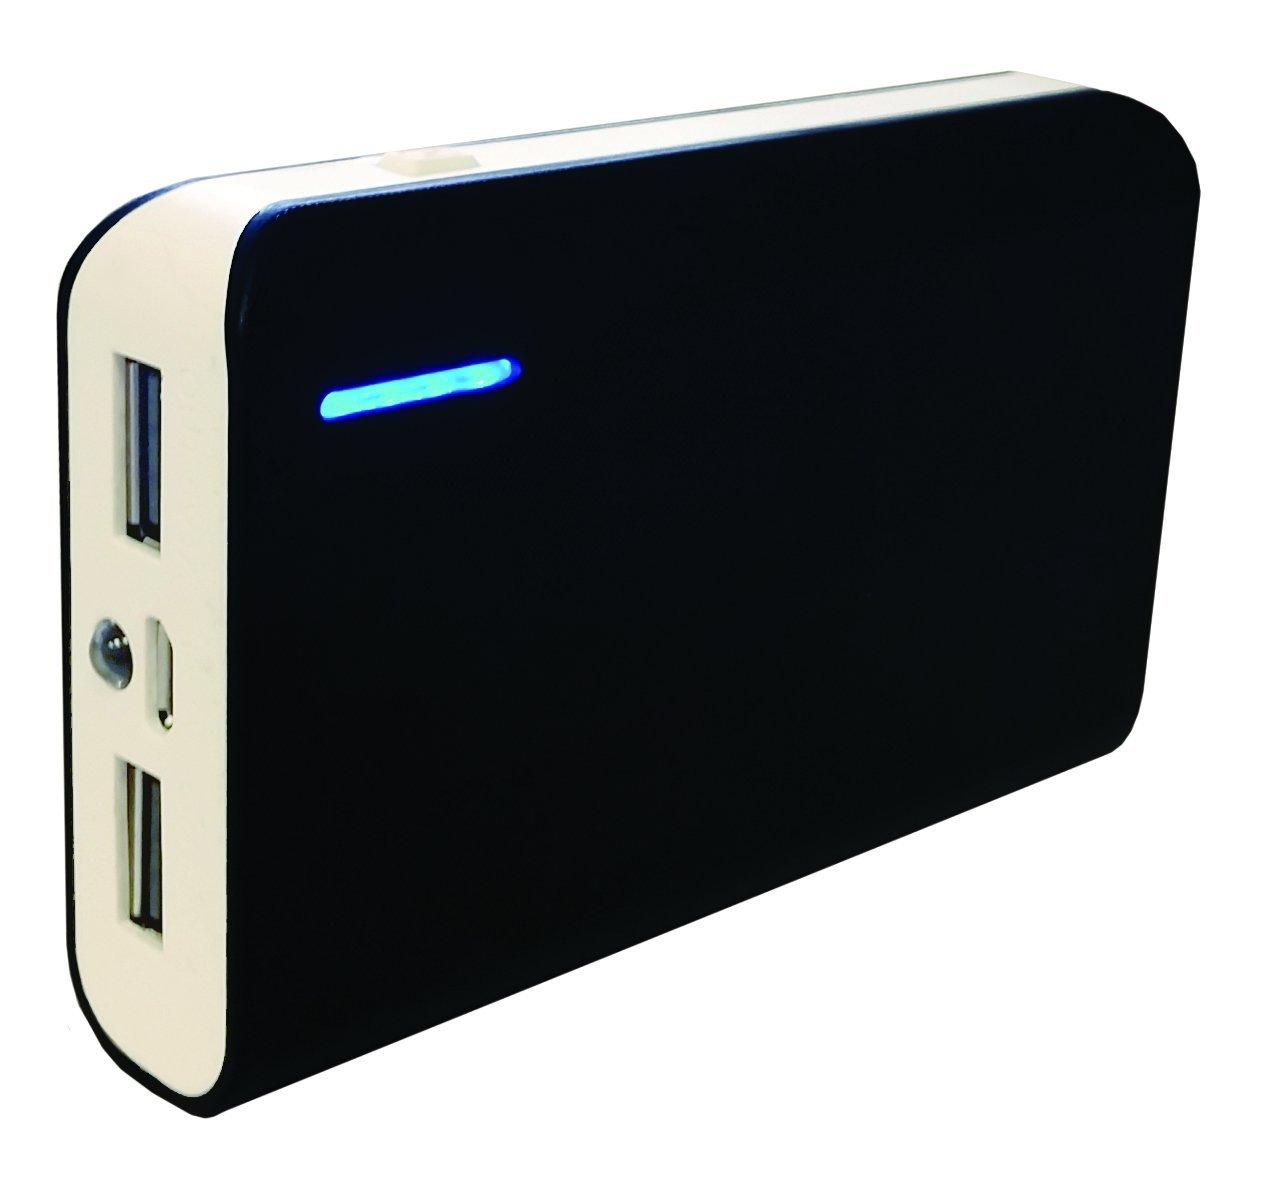 GetPower 6000mAh 2.1 Amp Portable Power Bank for Universal Smartphones - Retail Packaging - Black